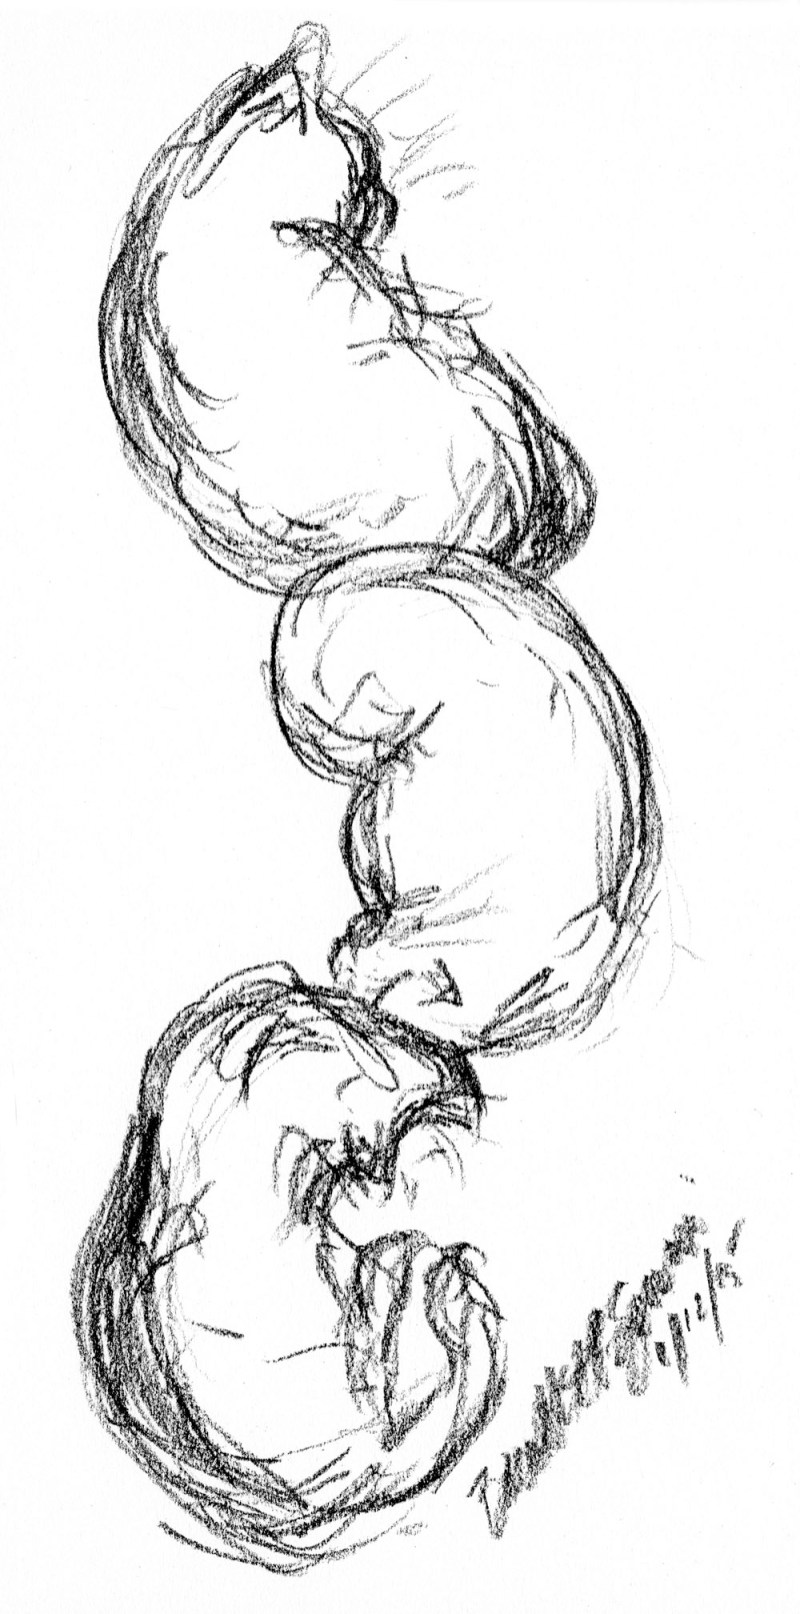 sketch of three black cats